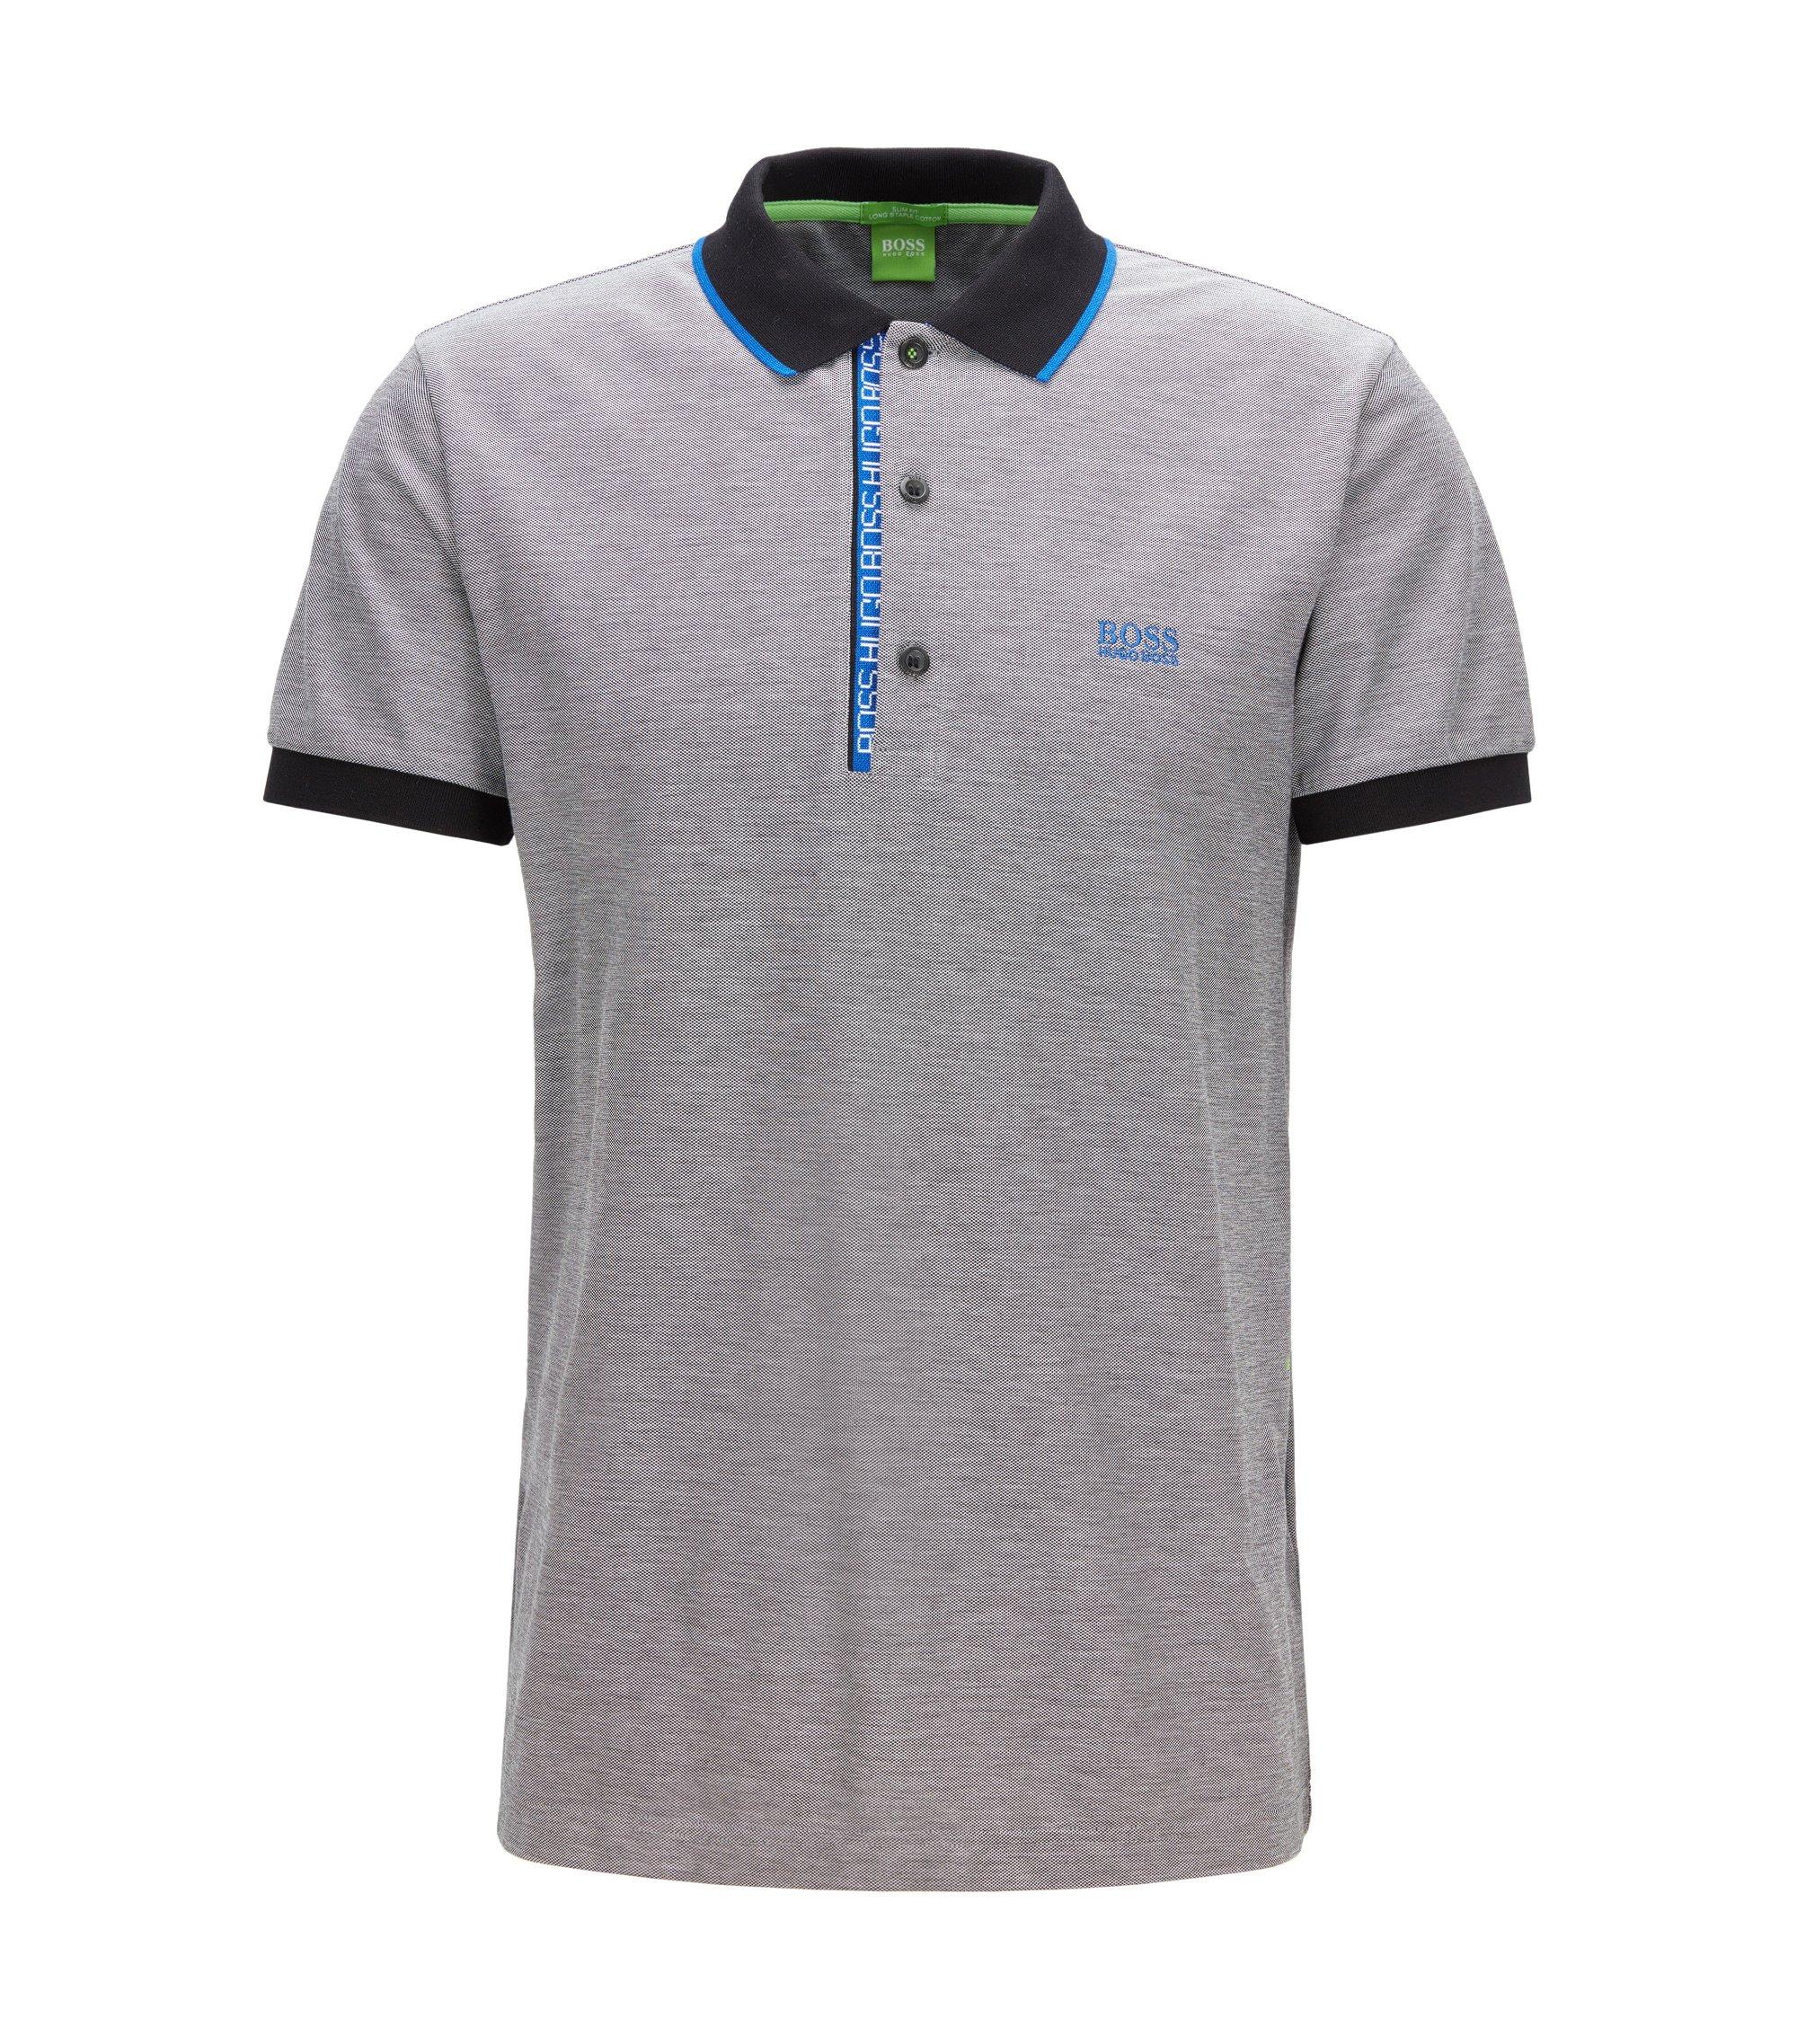 Oxfotd Cotton Polo Shirt, Slim Fit | Paule, Black